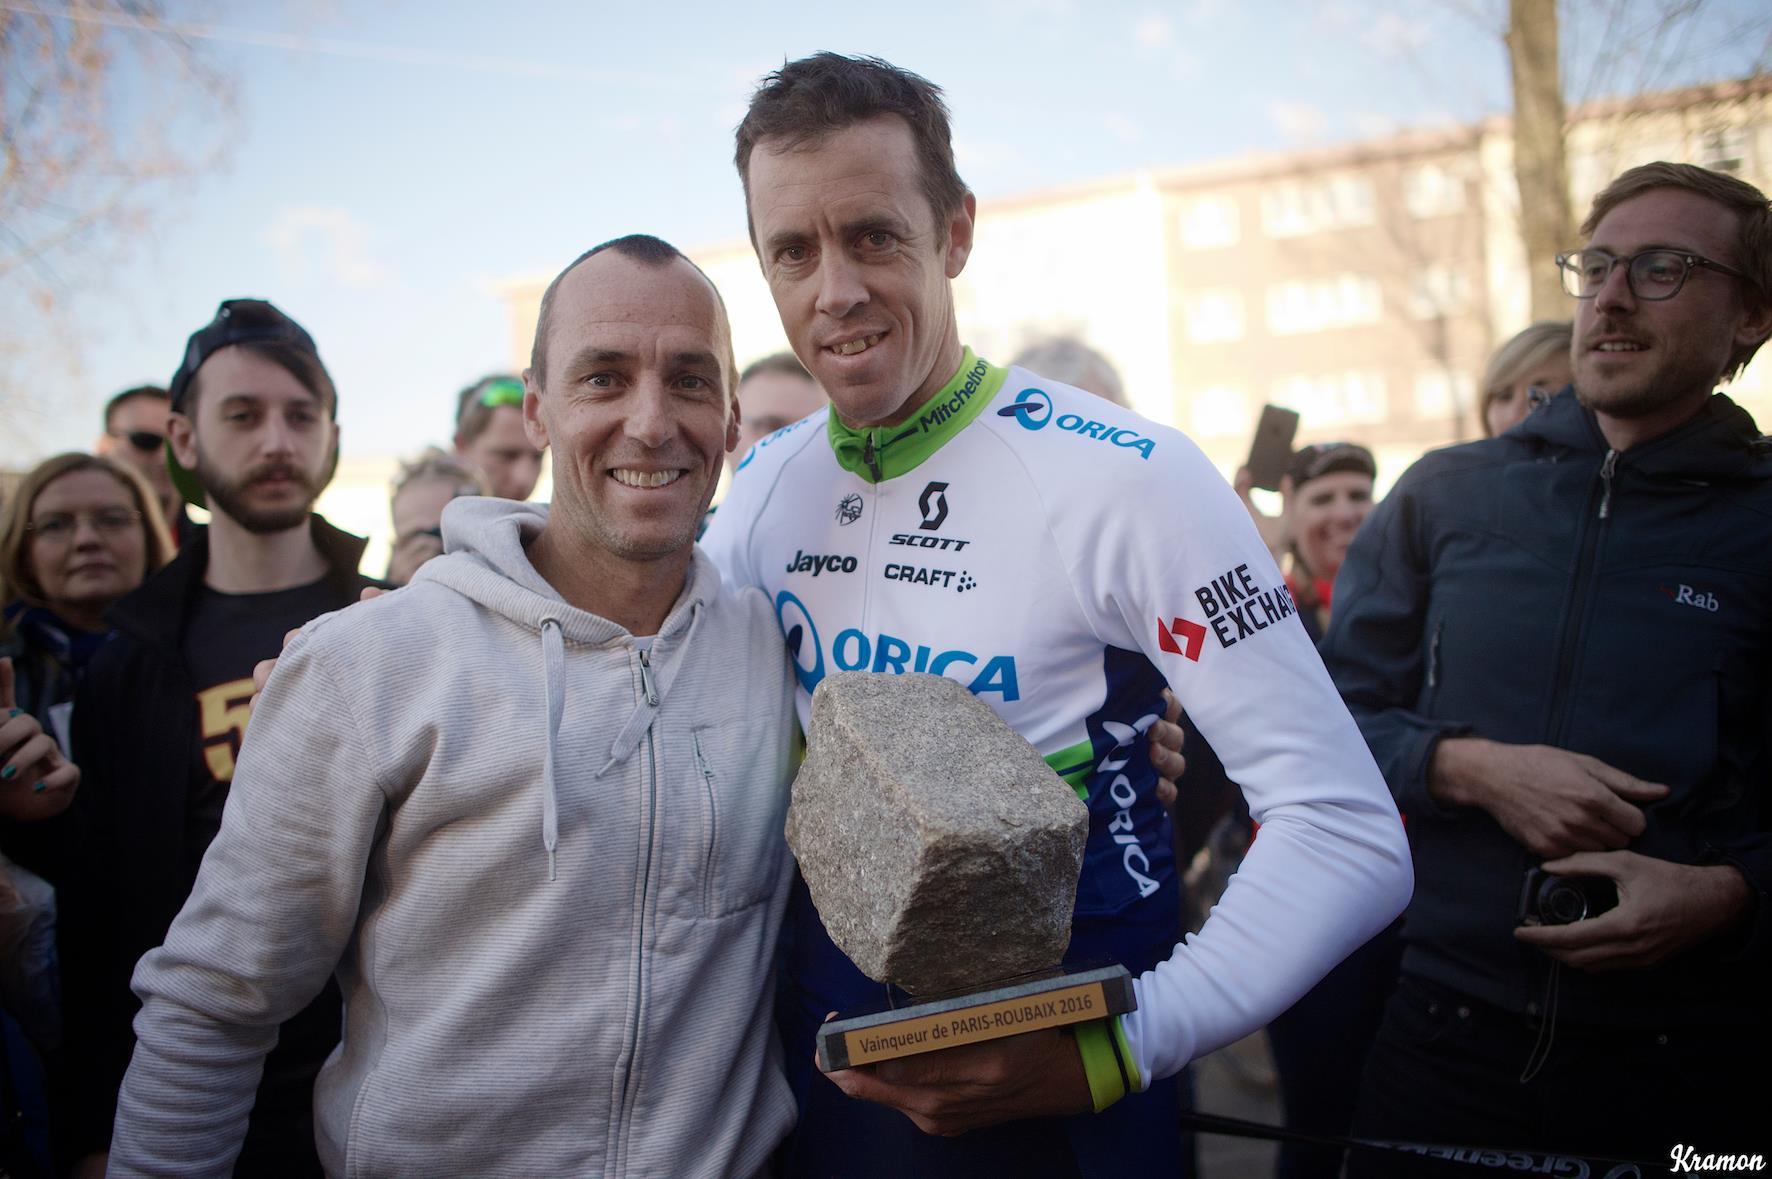 Kevin Poulton with Paris-Roubaix Winner Mathew Hayman